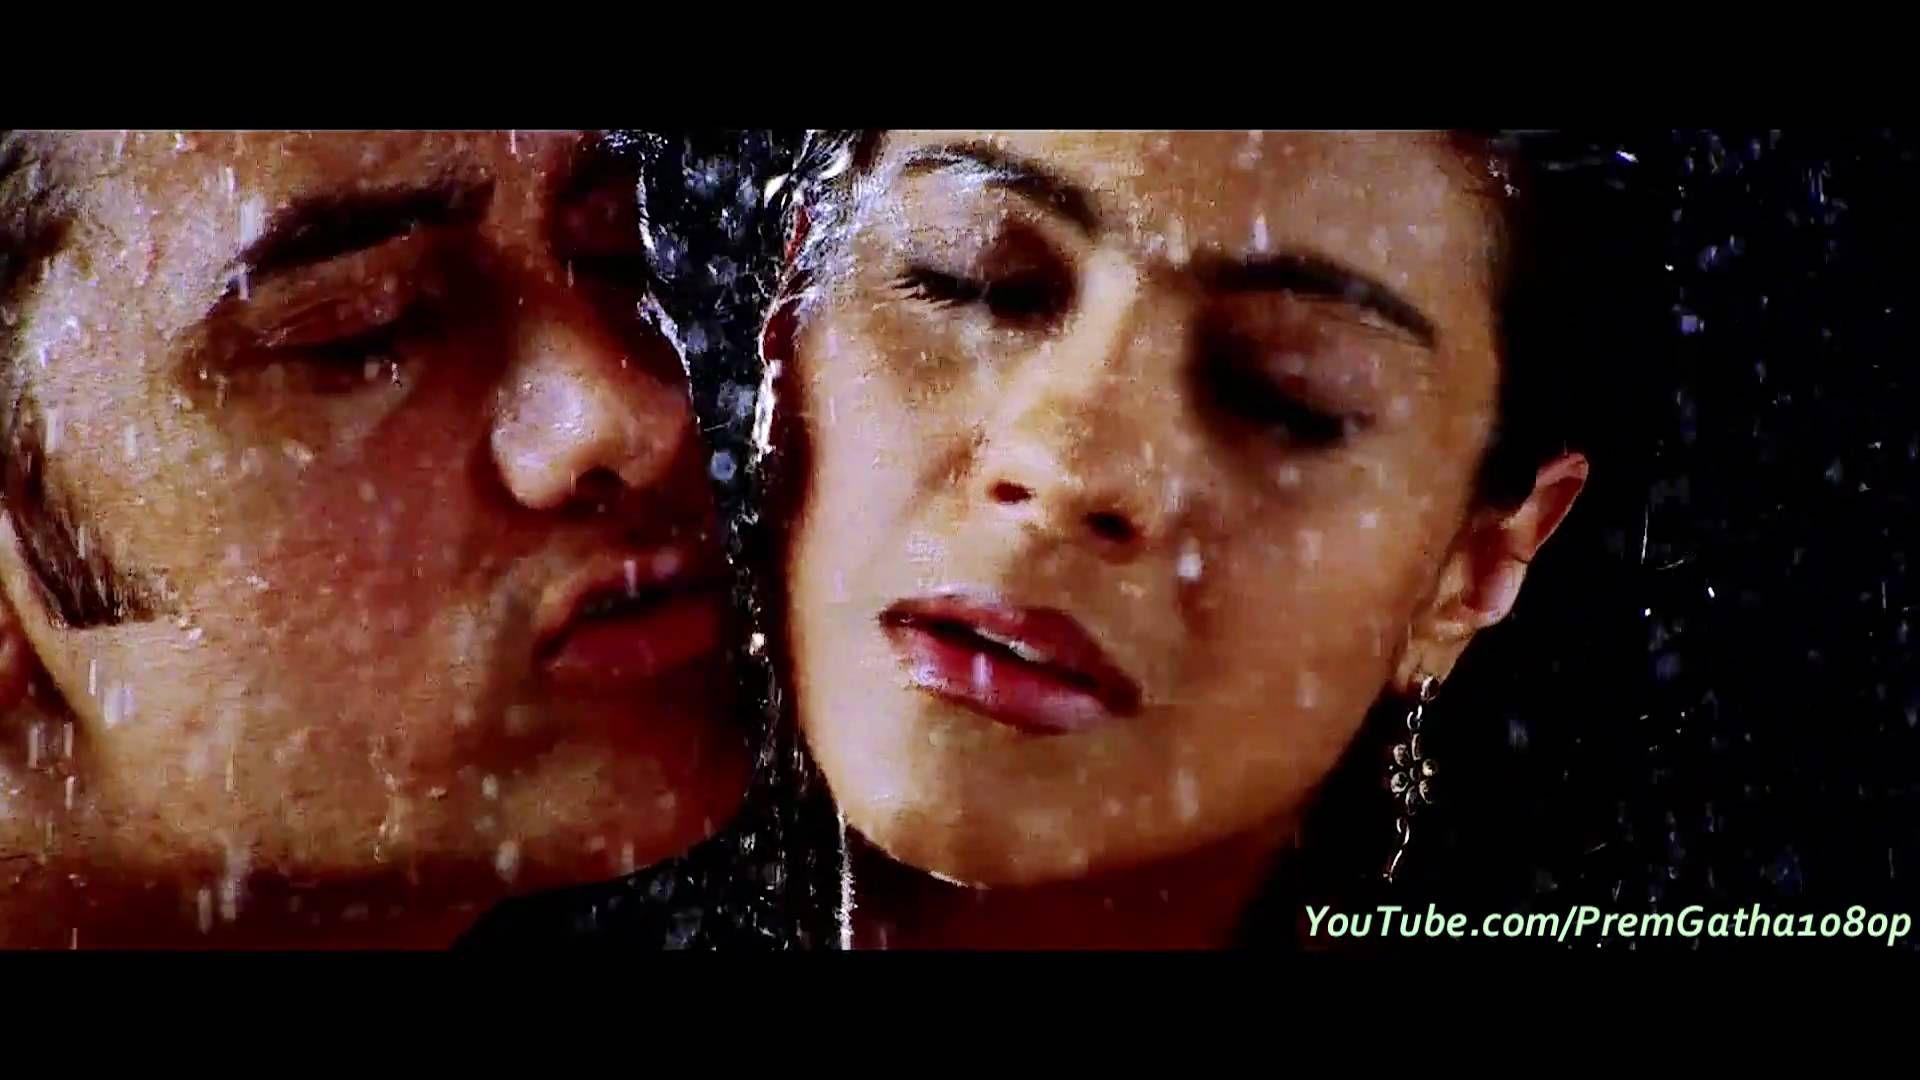 Dekho Na Fanaa 1080p Hd Song Songs Fanaa Film Romantic Songs